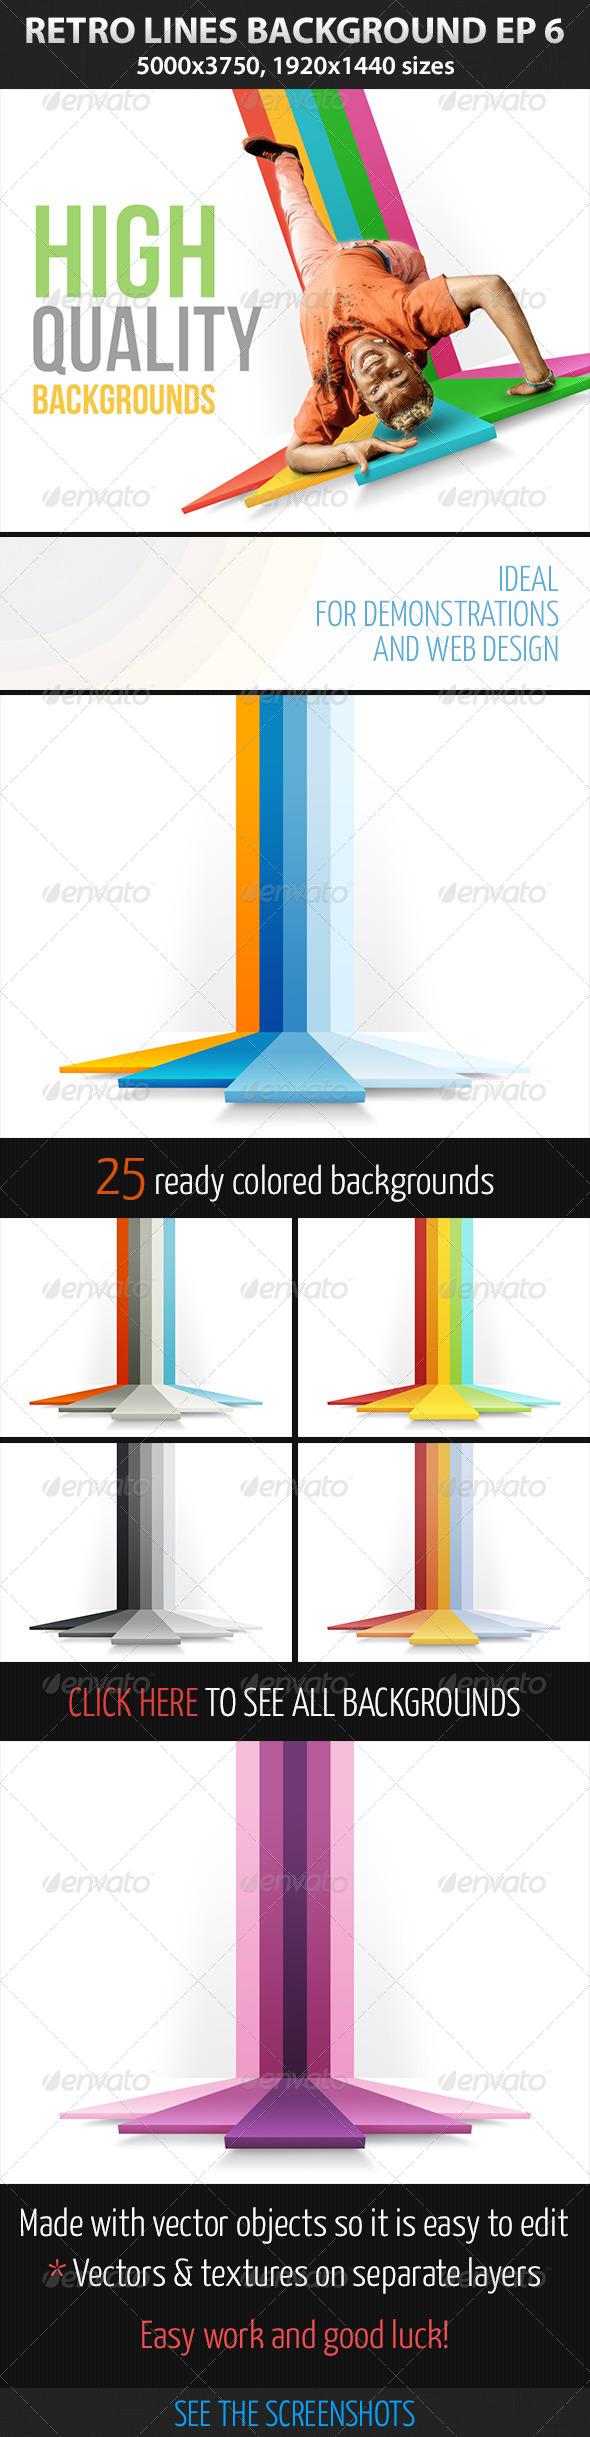 GraphicRiver Retro Lines Background ep 6 4378860